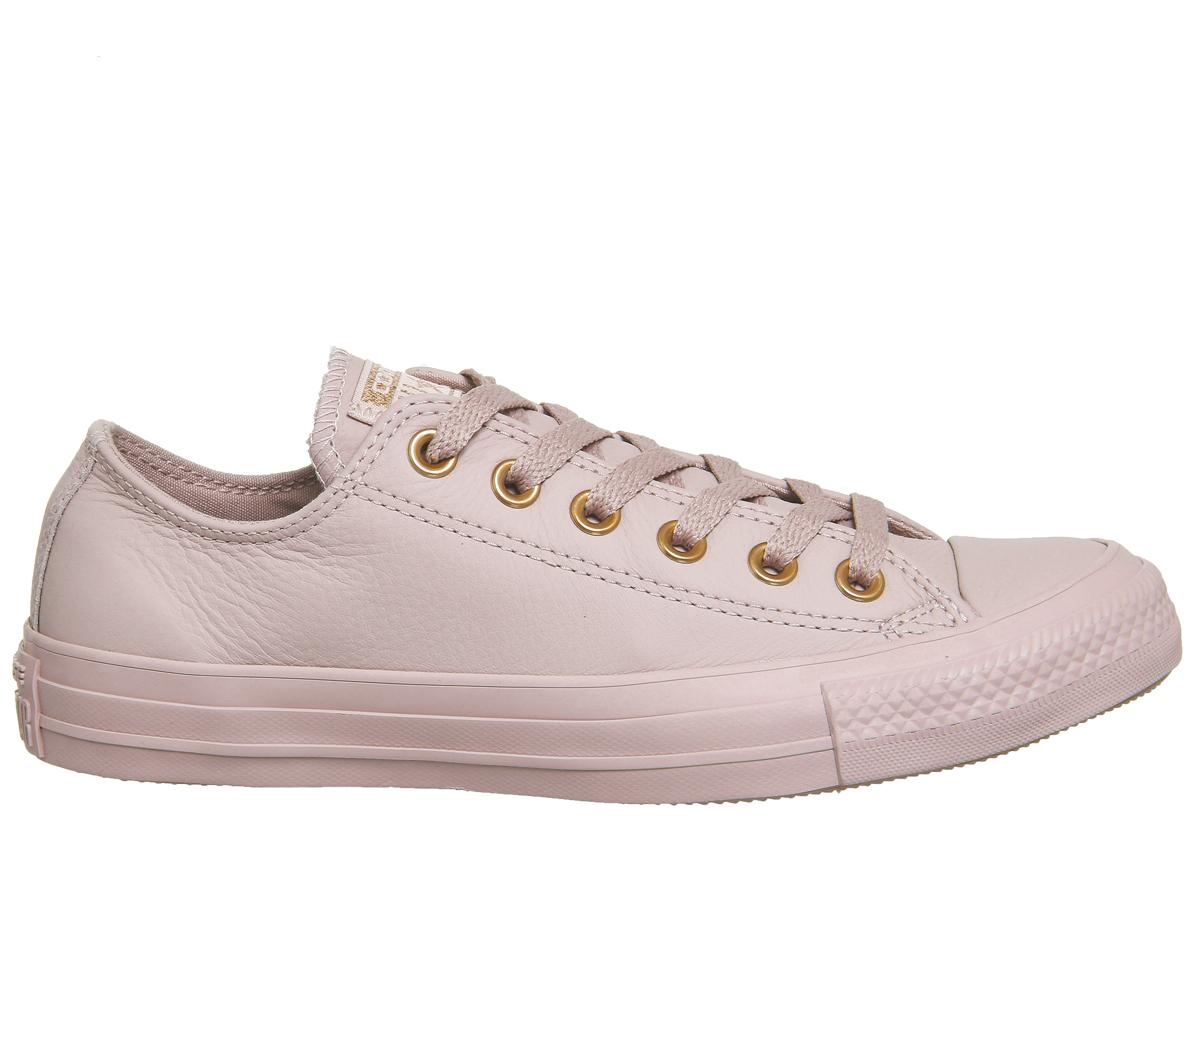 blush leather converse